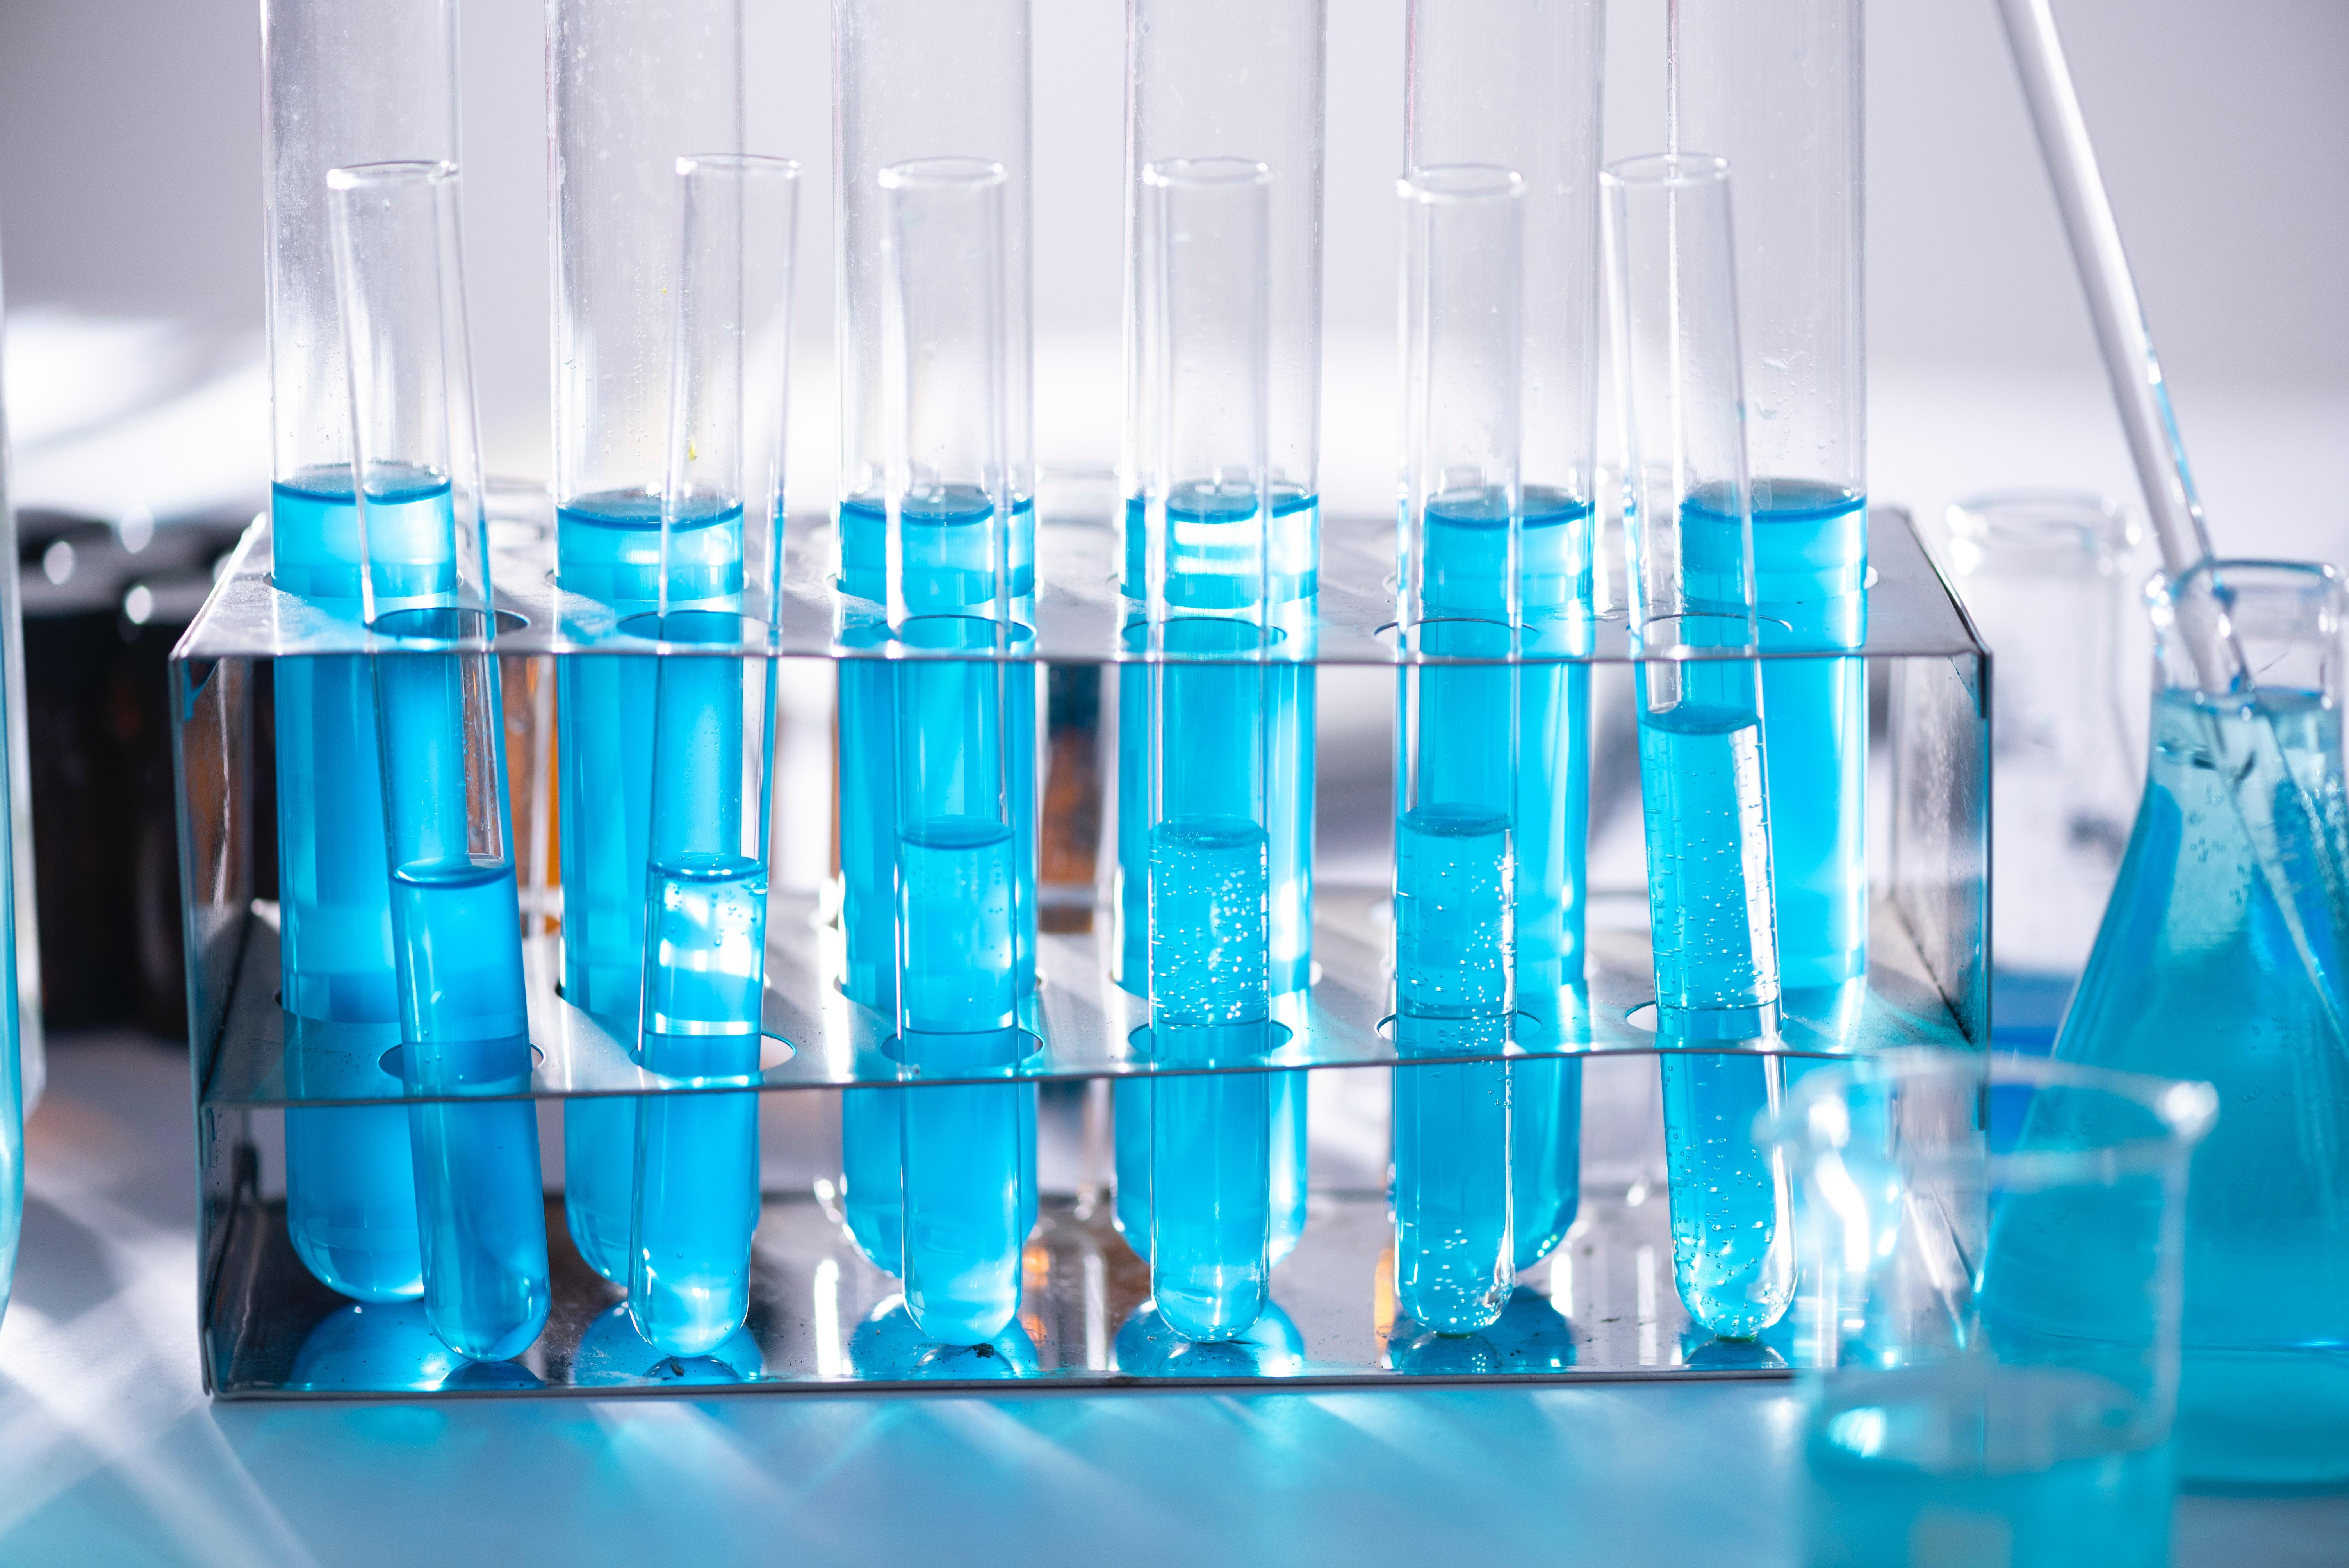 laboratory-test-tubes-2280549